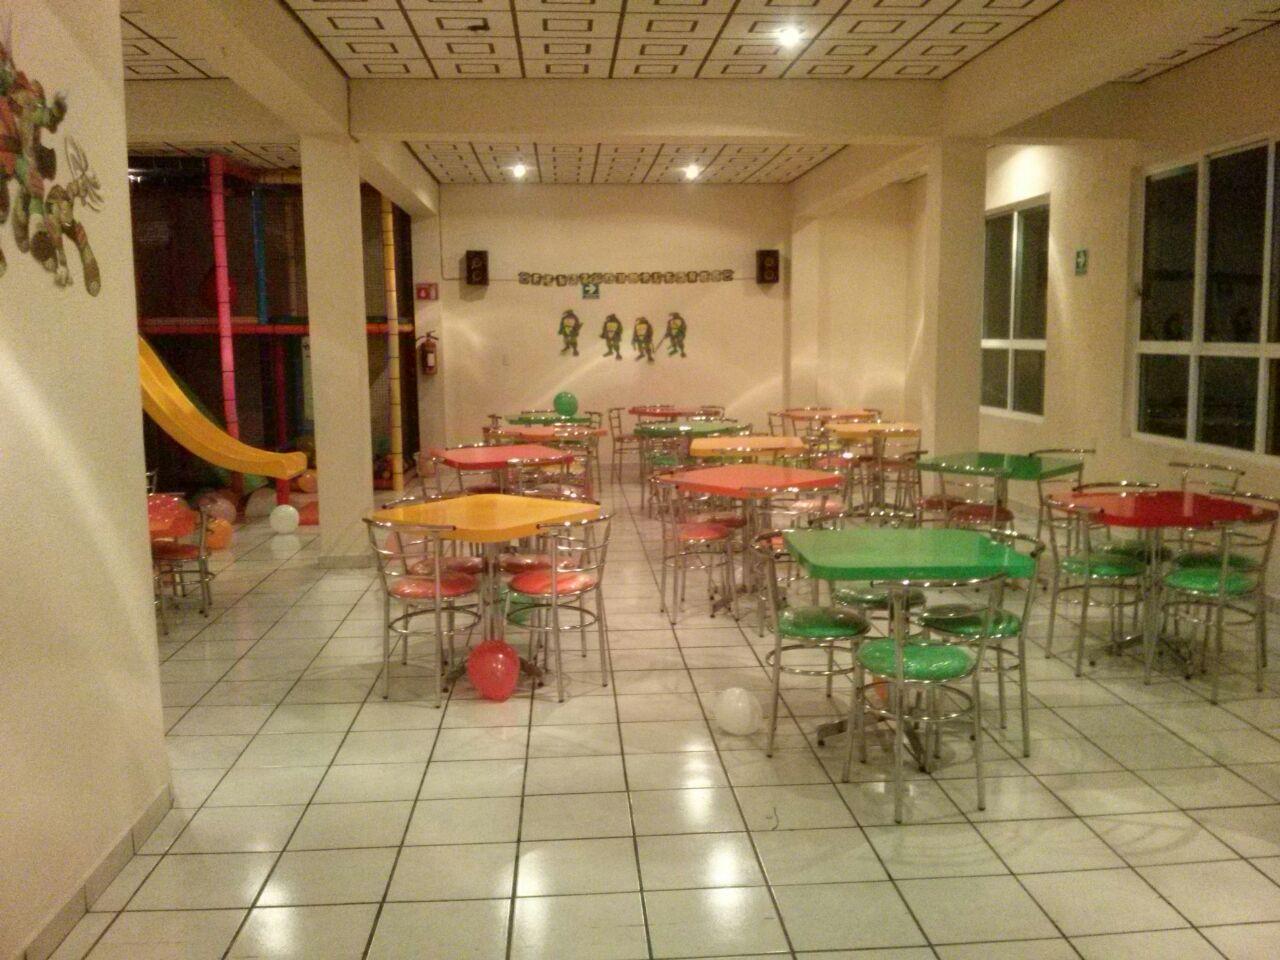 Salon de fiestas infantiles peque os traviesos - Fotos de salones pequenos ...